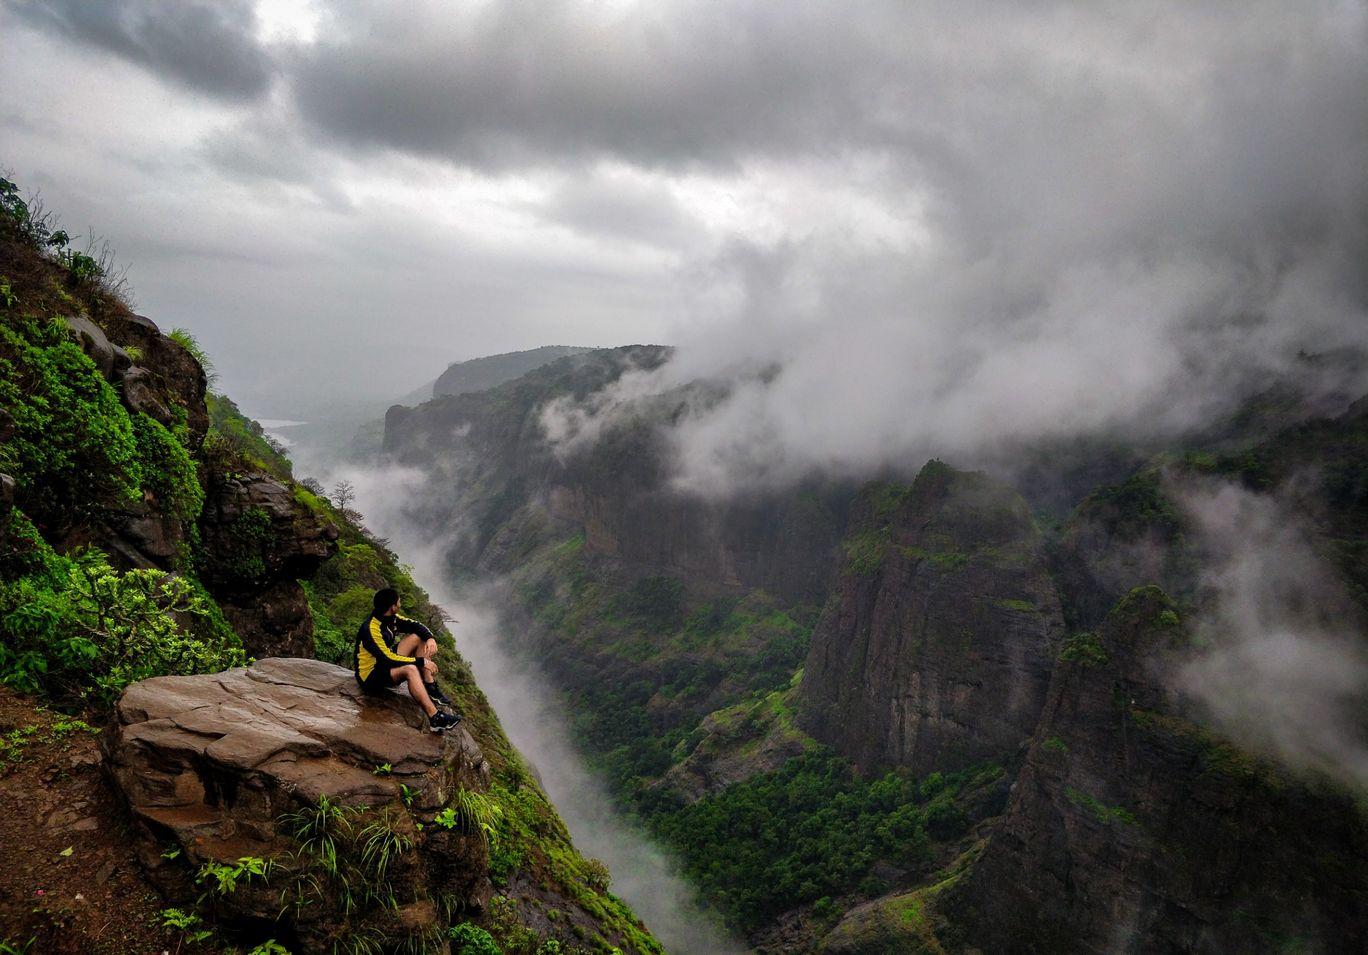 Photo of Kundalika Valley By Pratham Manmode